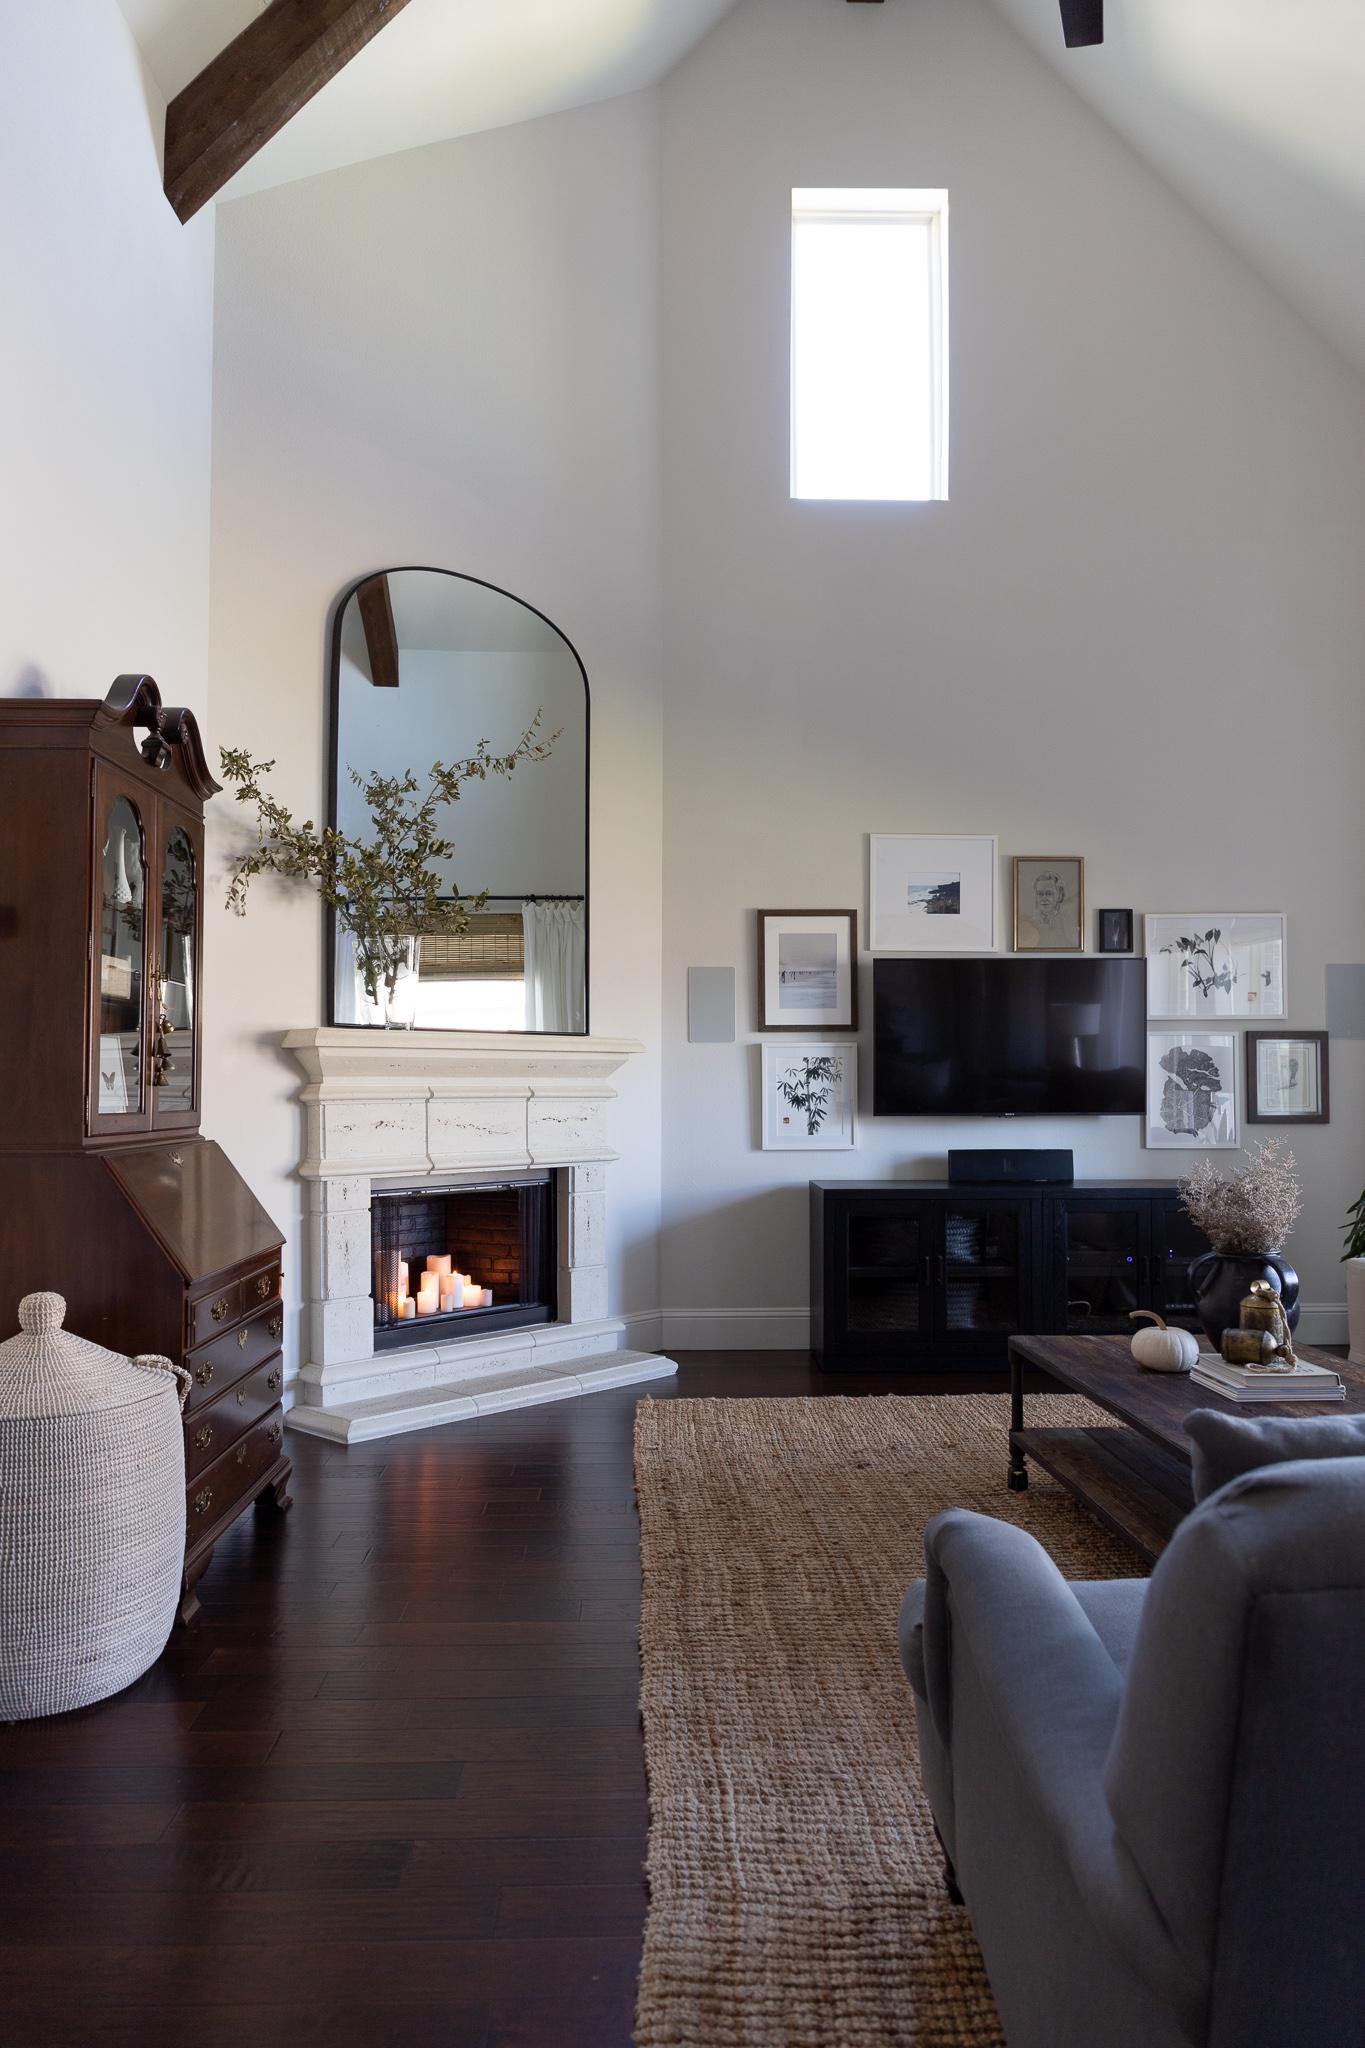 large mirror over fireplace, Serena & Lily La Jolla Basket